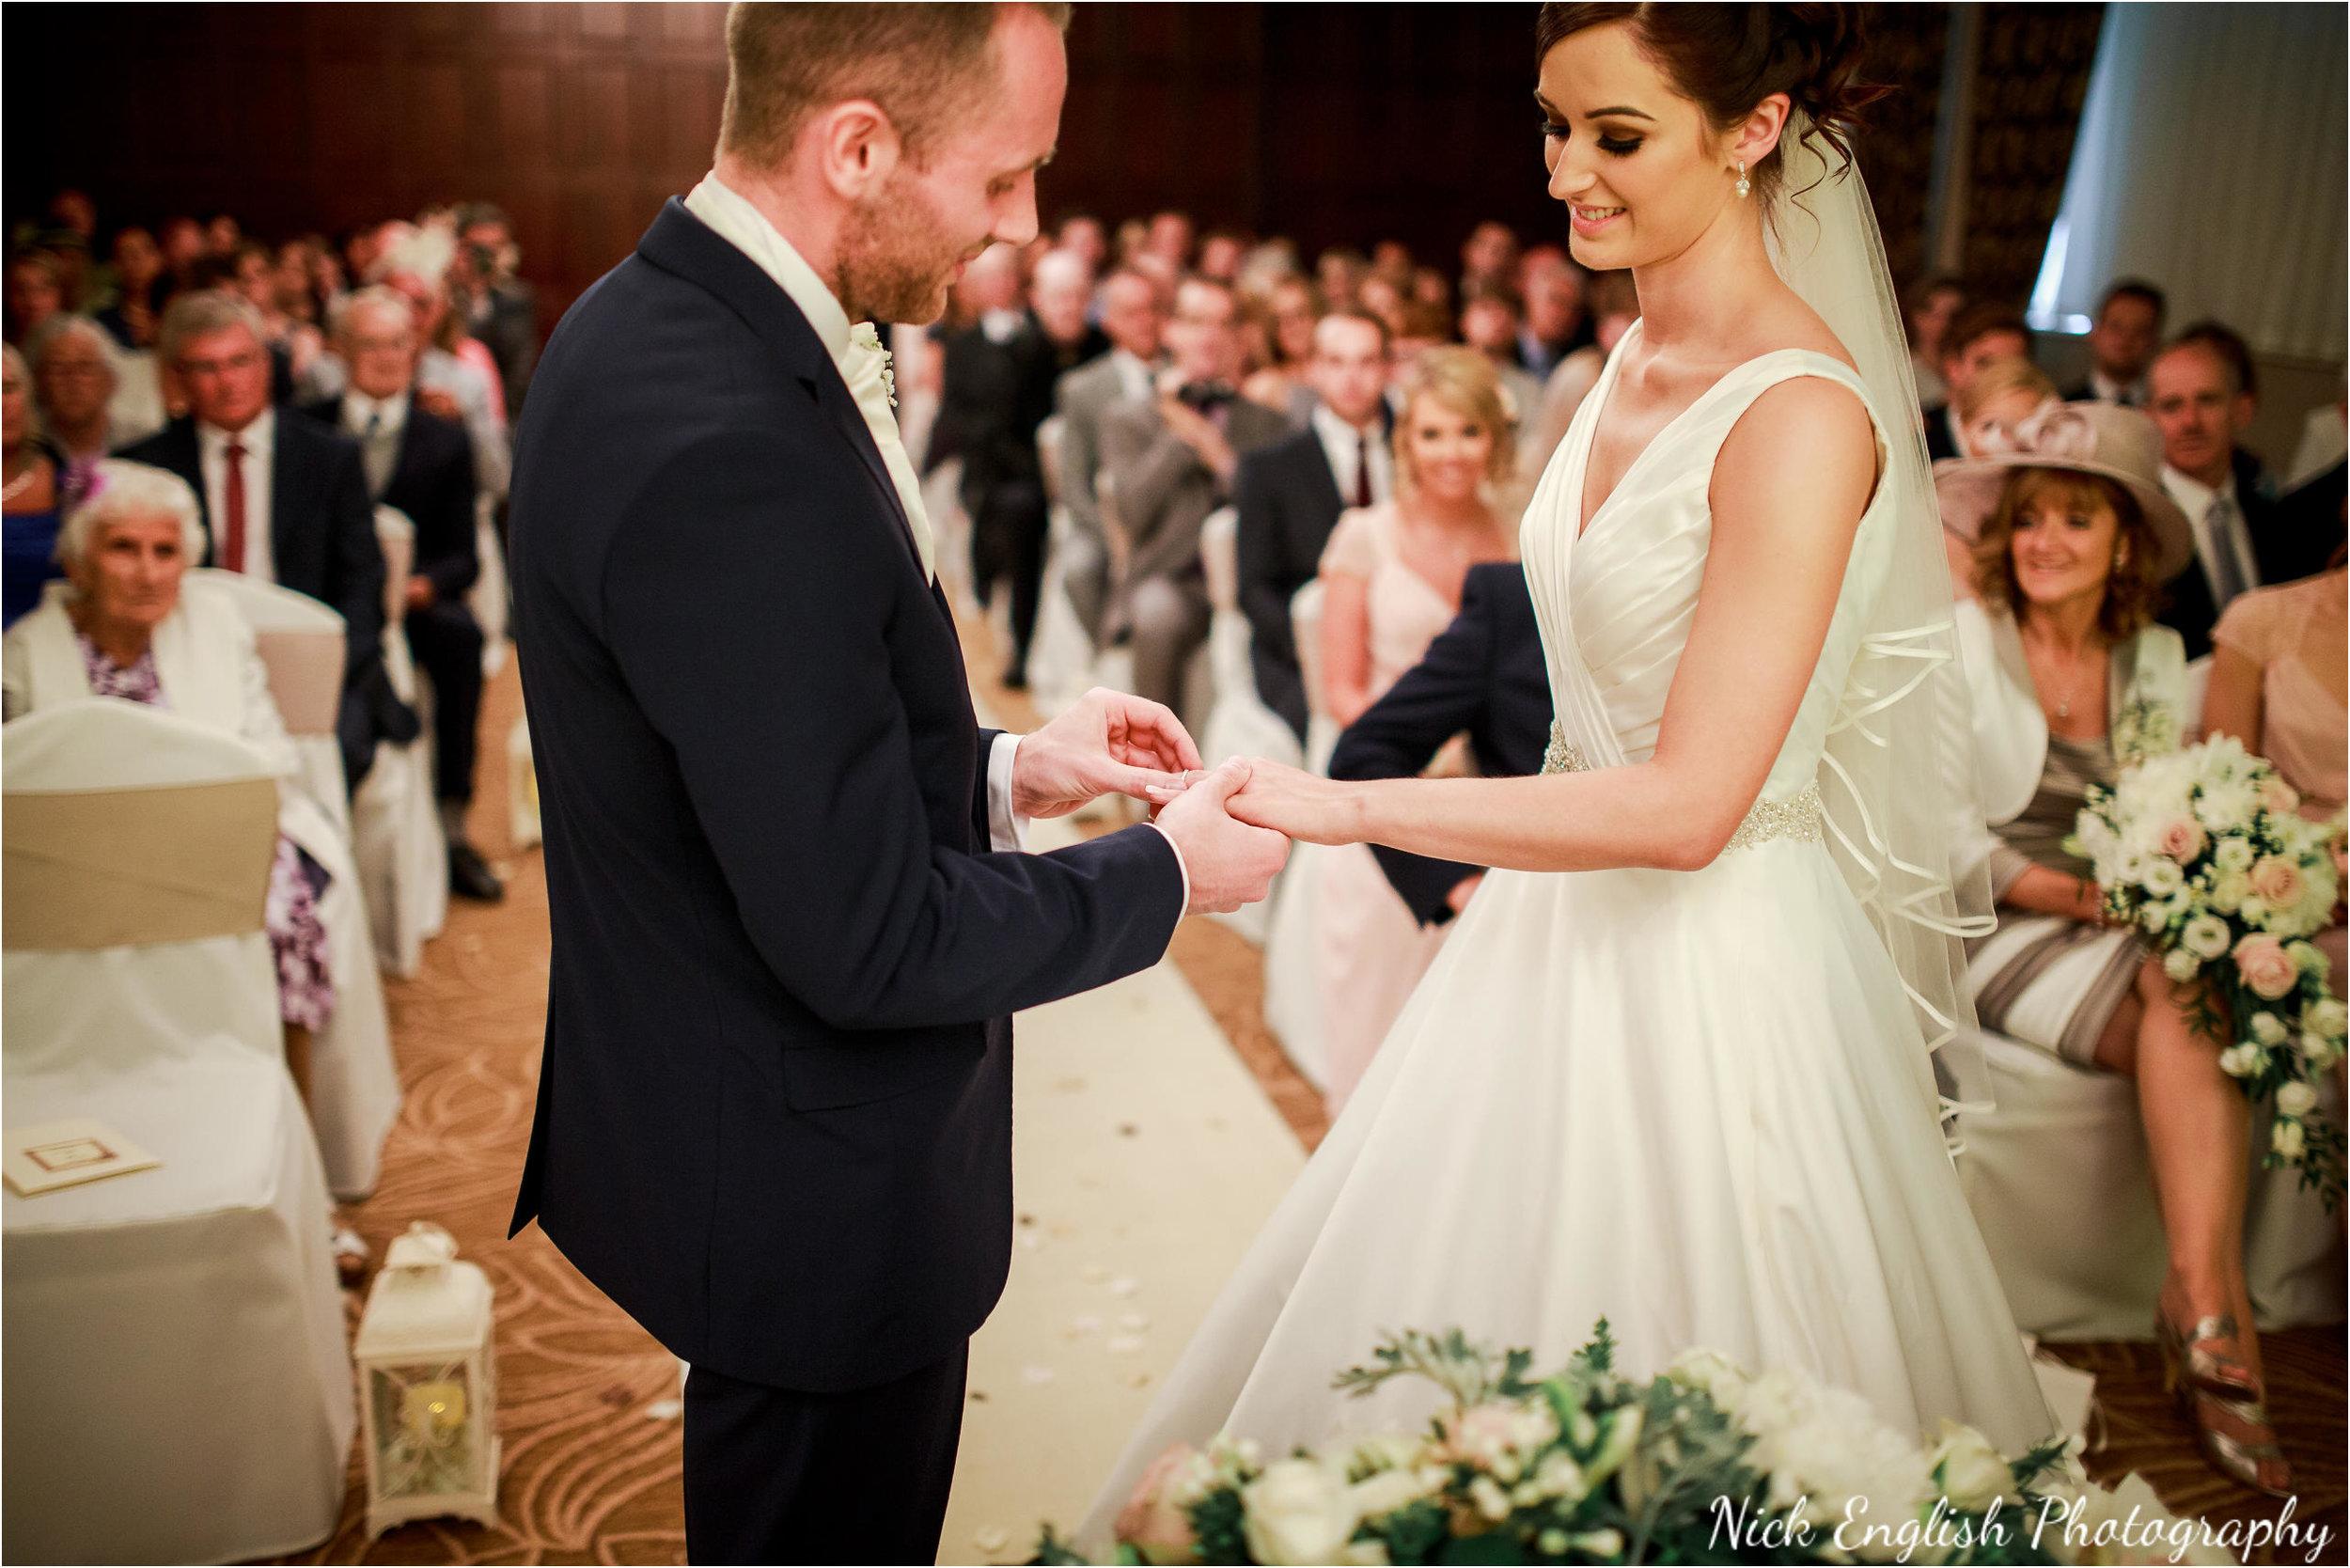 Emily David Wedding Photographs at Barton Grange Preston by Nick English Photography 72jpg.jpeg